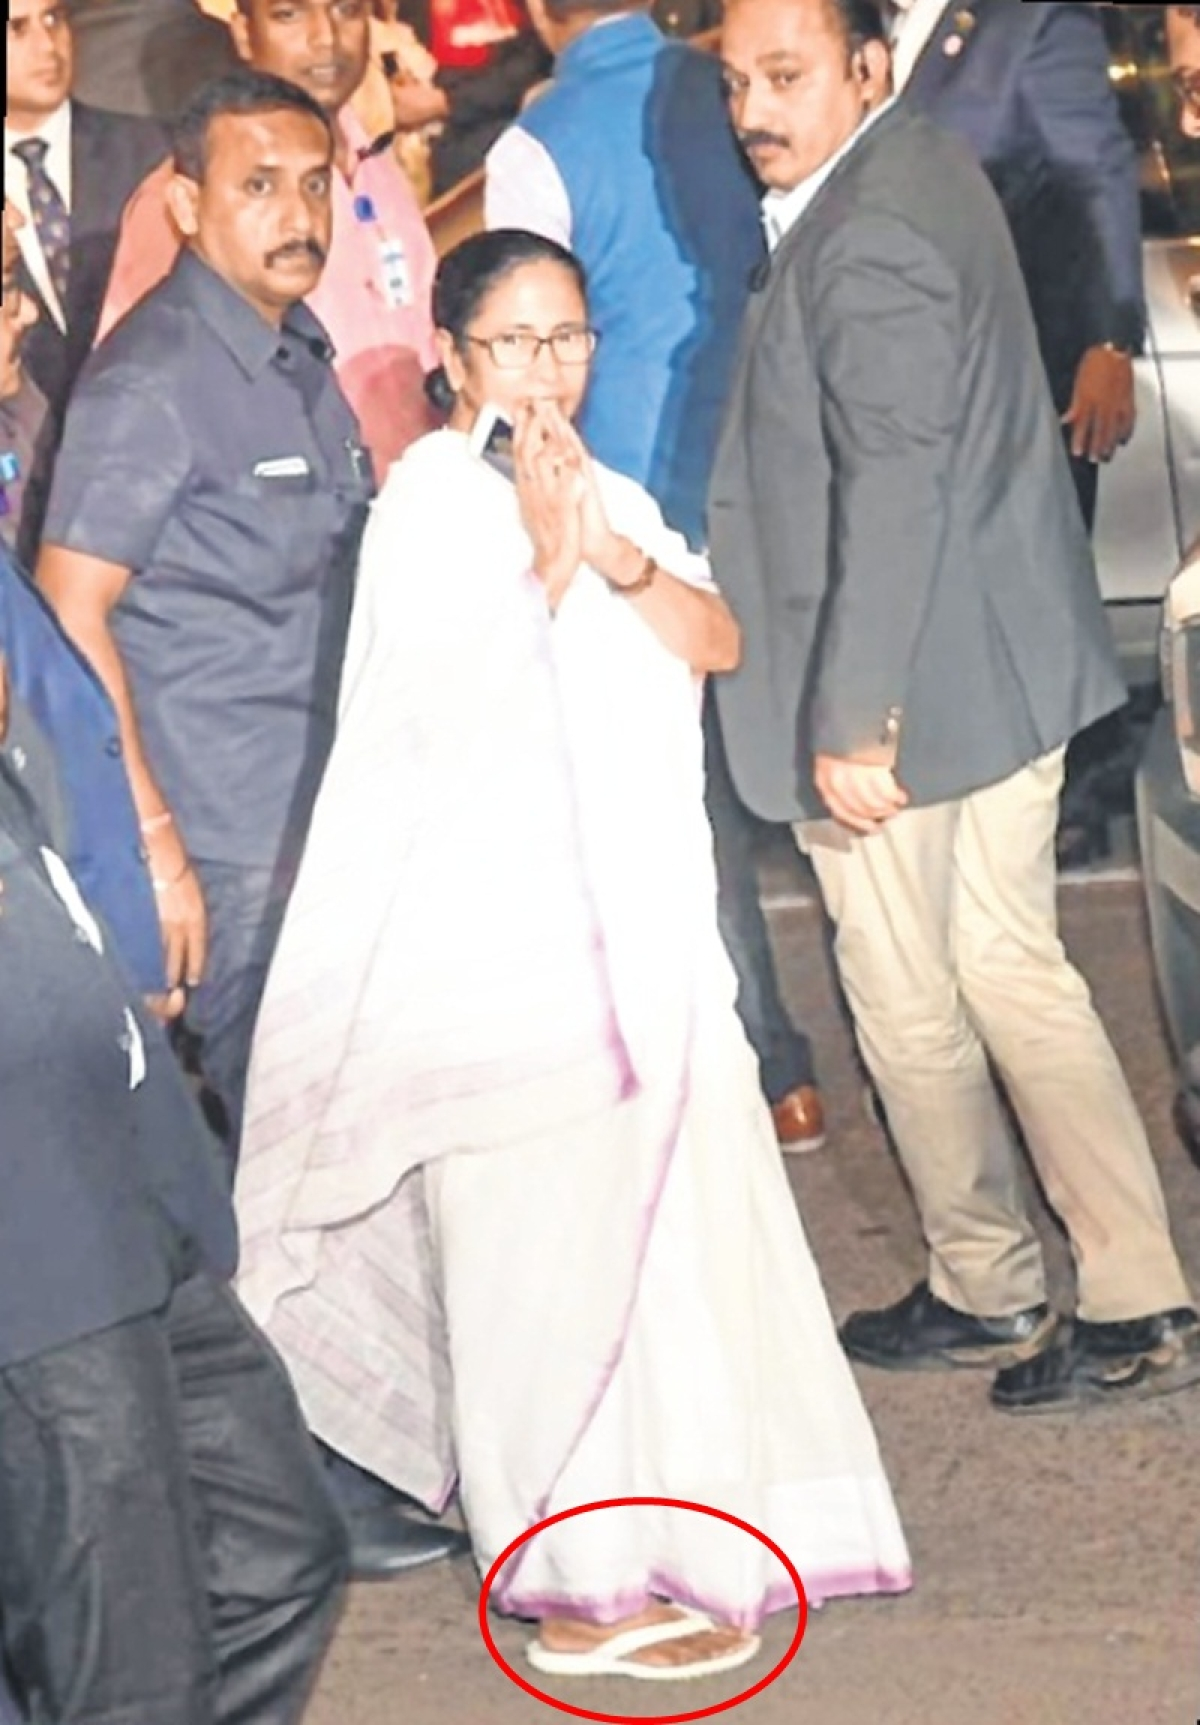 West Bengal CM Mamata Banerjee in flip-flops at Antilia for Isha-Anand wedding